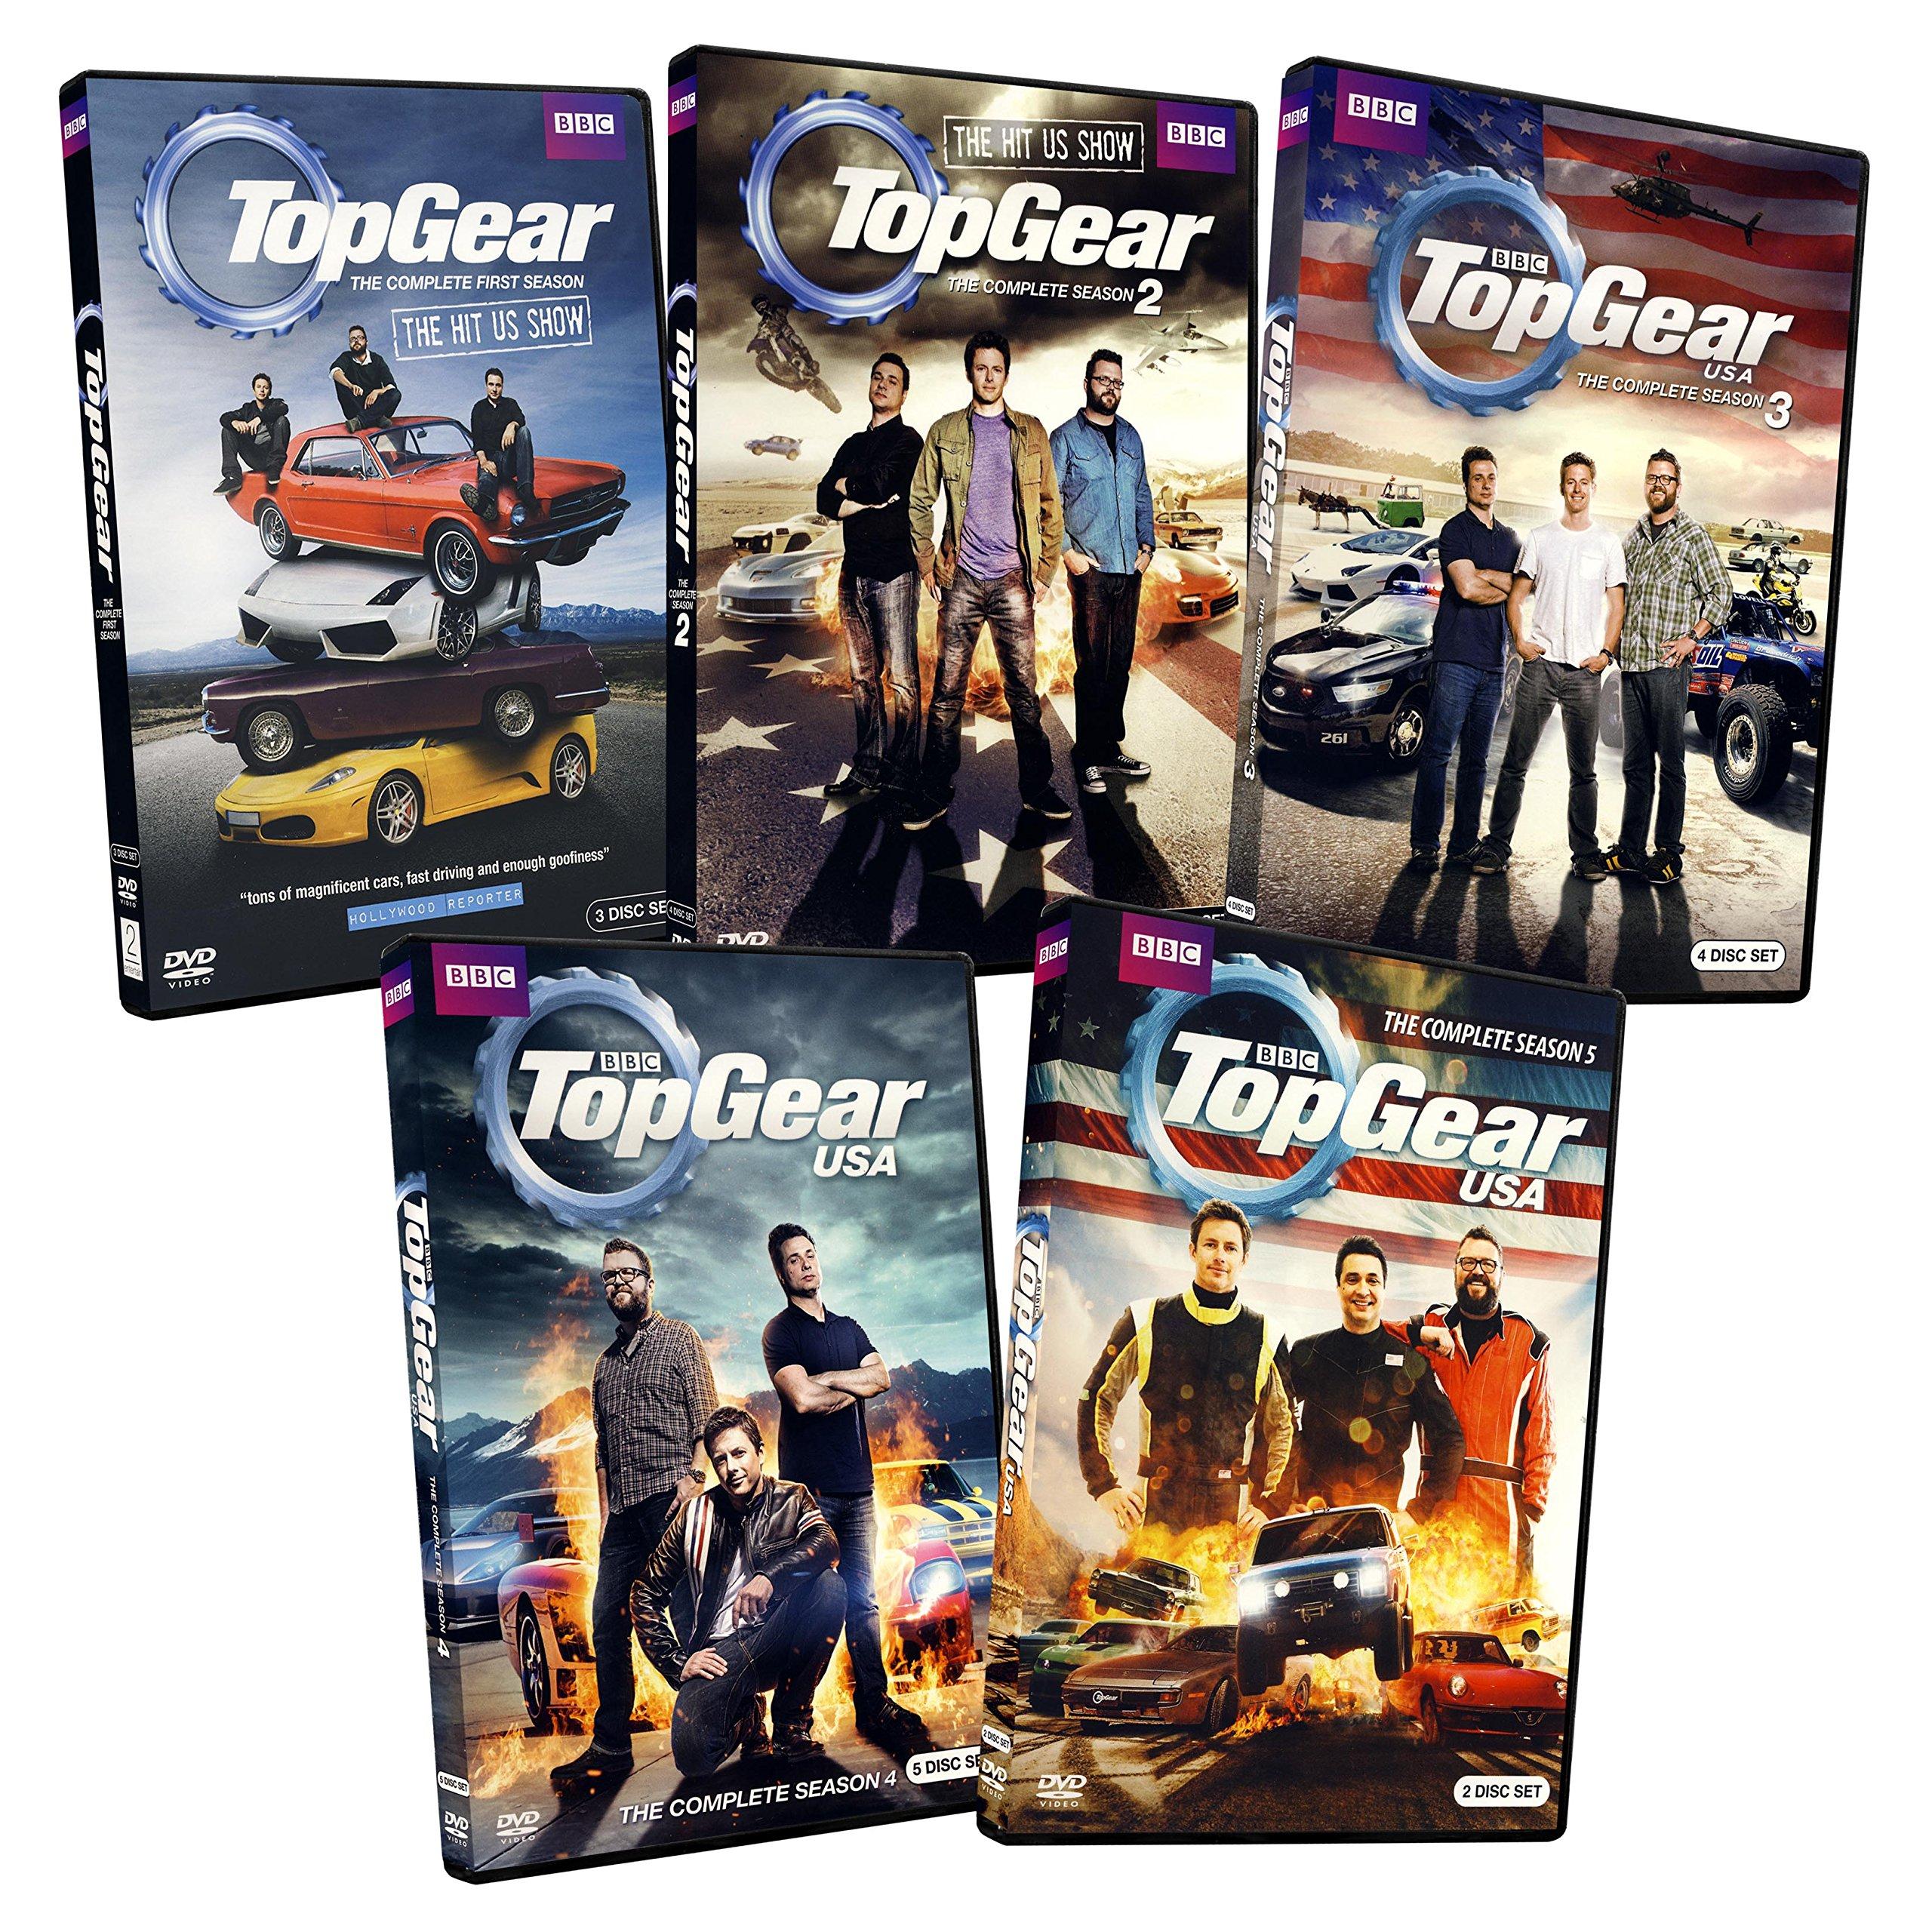 Top Gear USA: The Complete Season 1 - 5